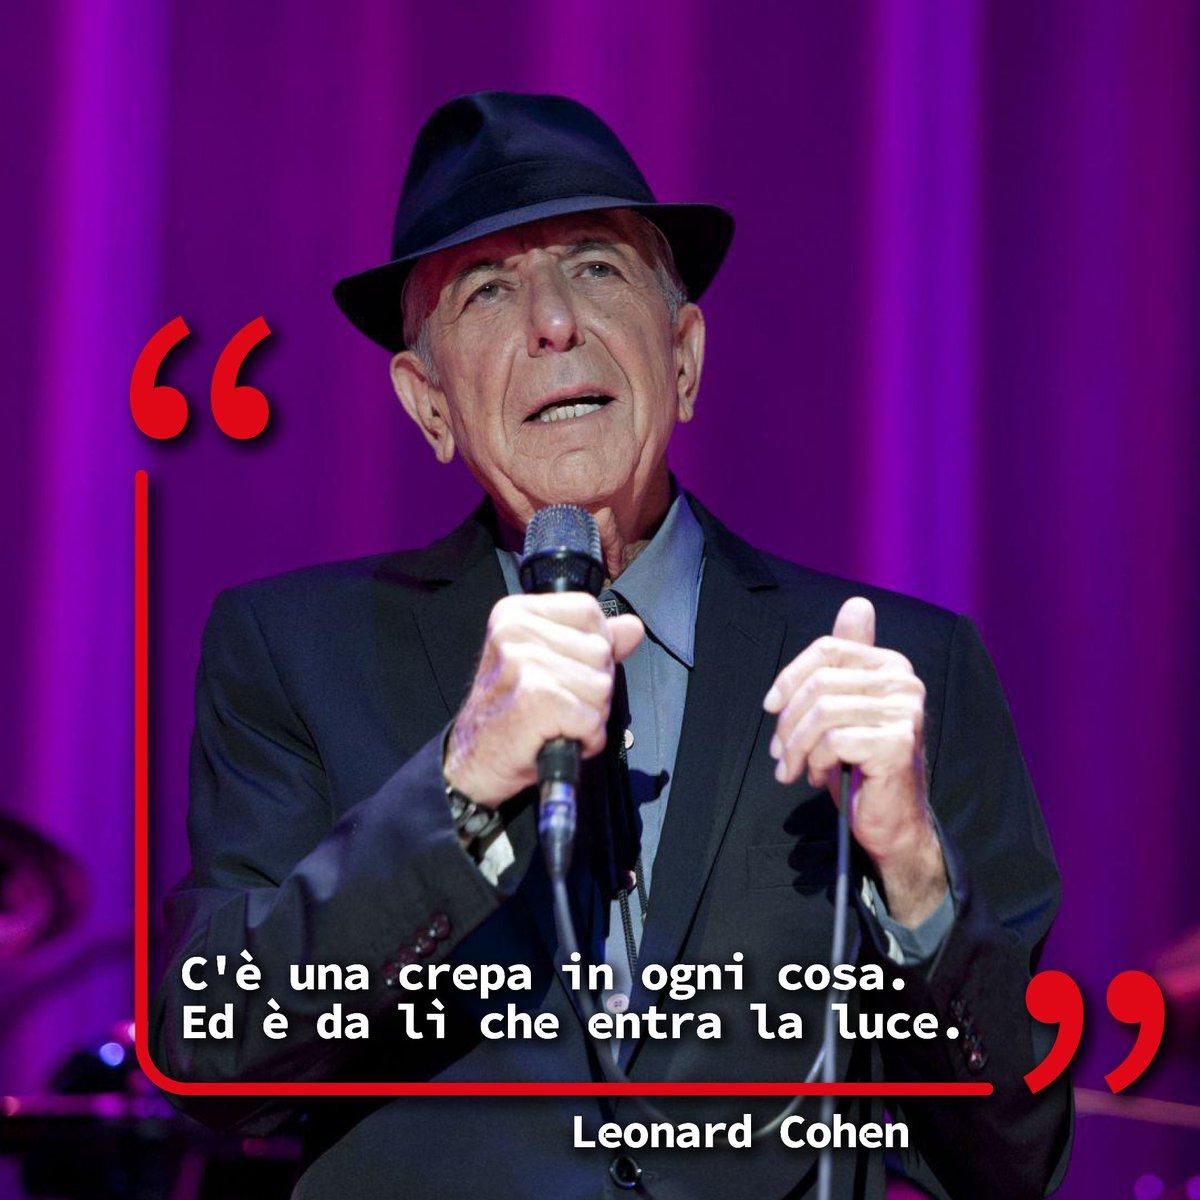 #LeonardCohen